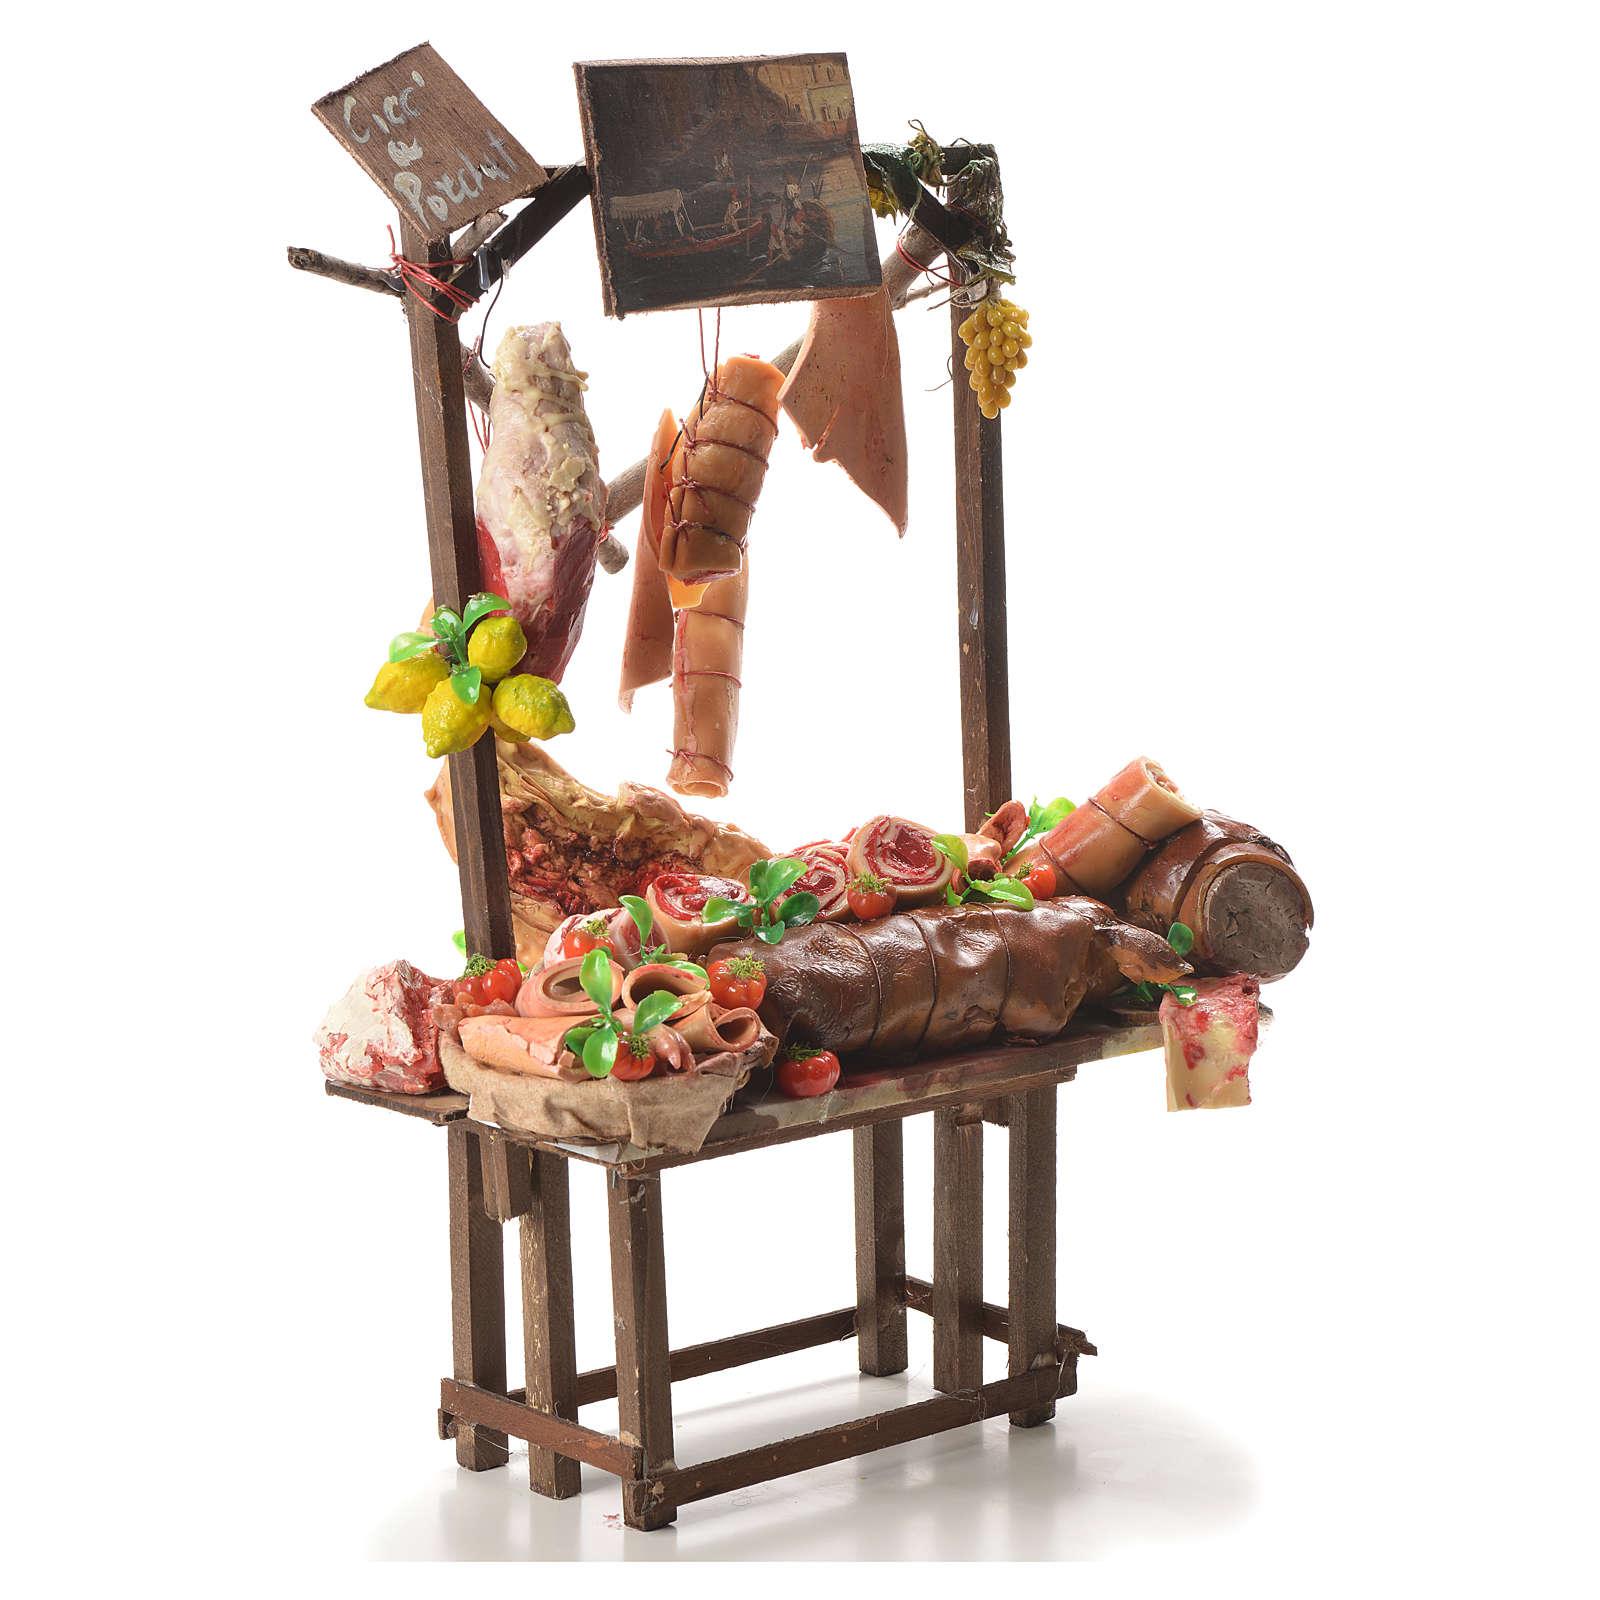 Stand Spanferkelhändler Wachs Krippe 52x38x20 cm 4